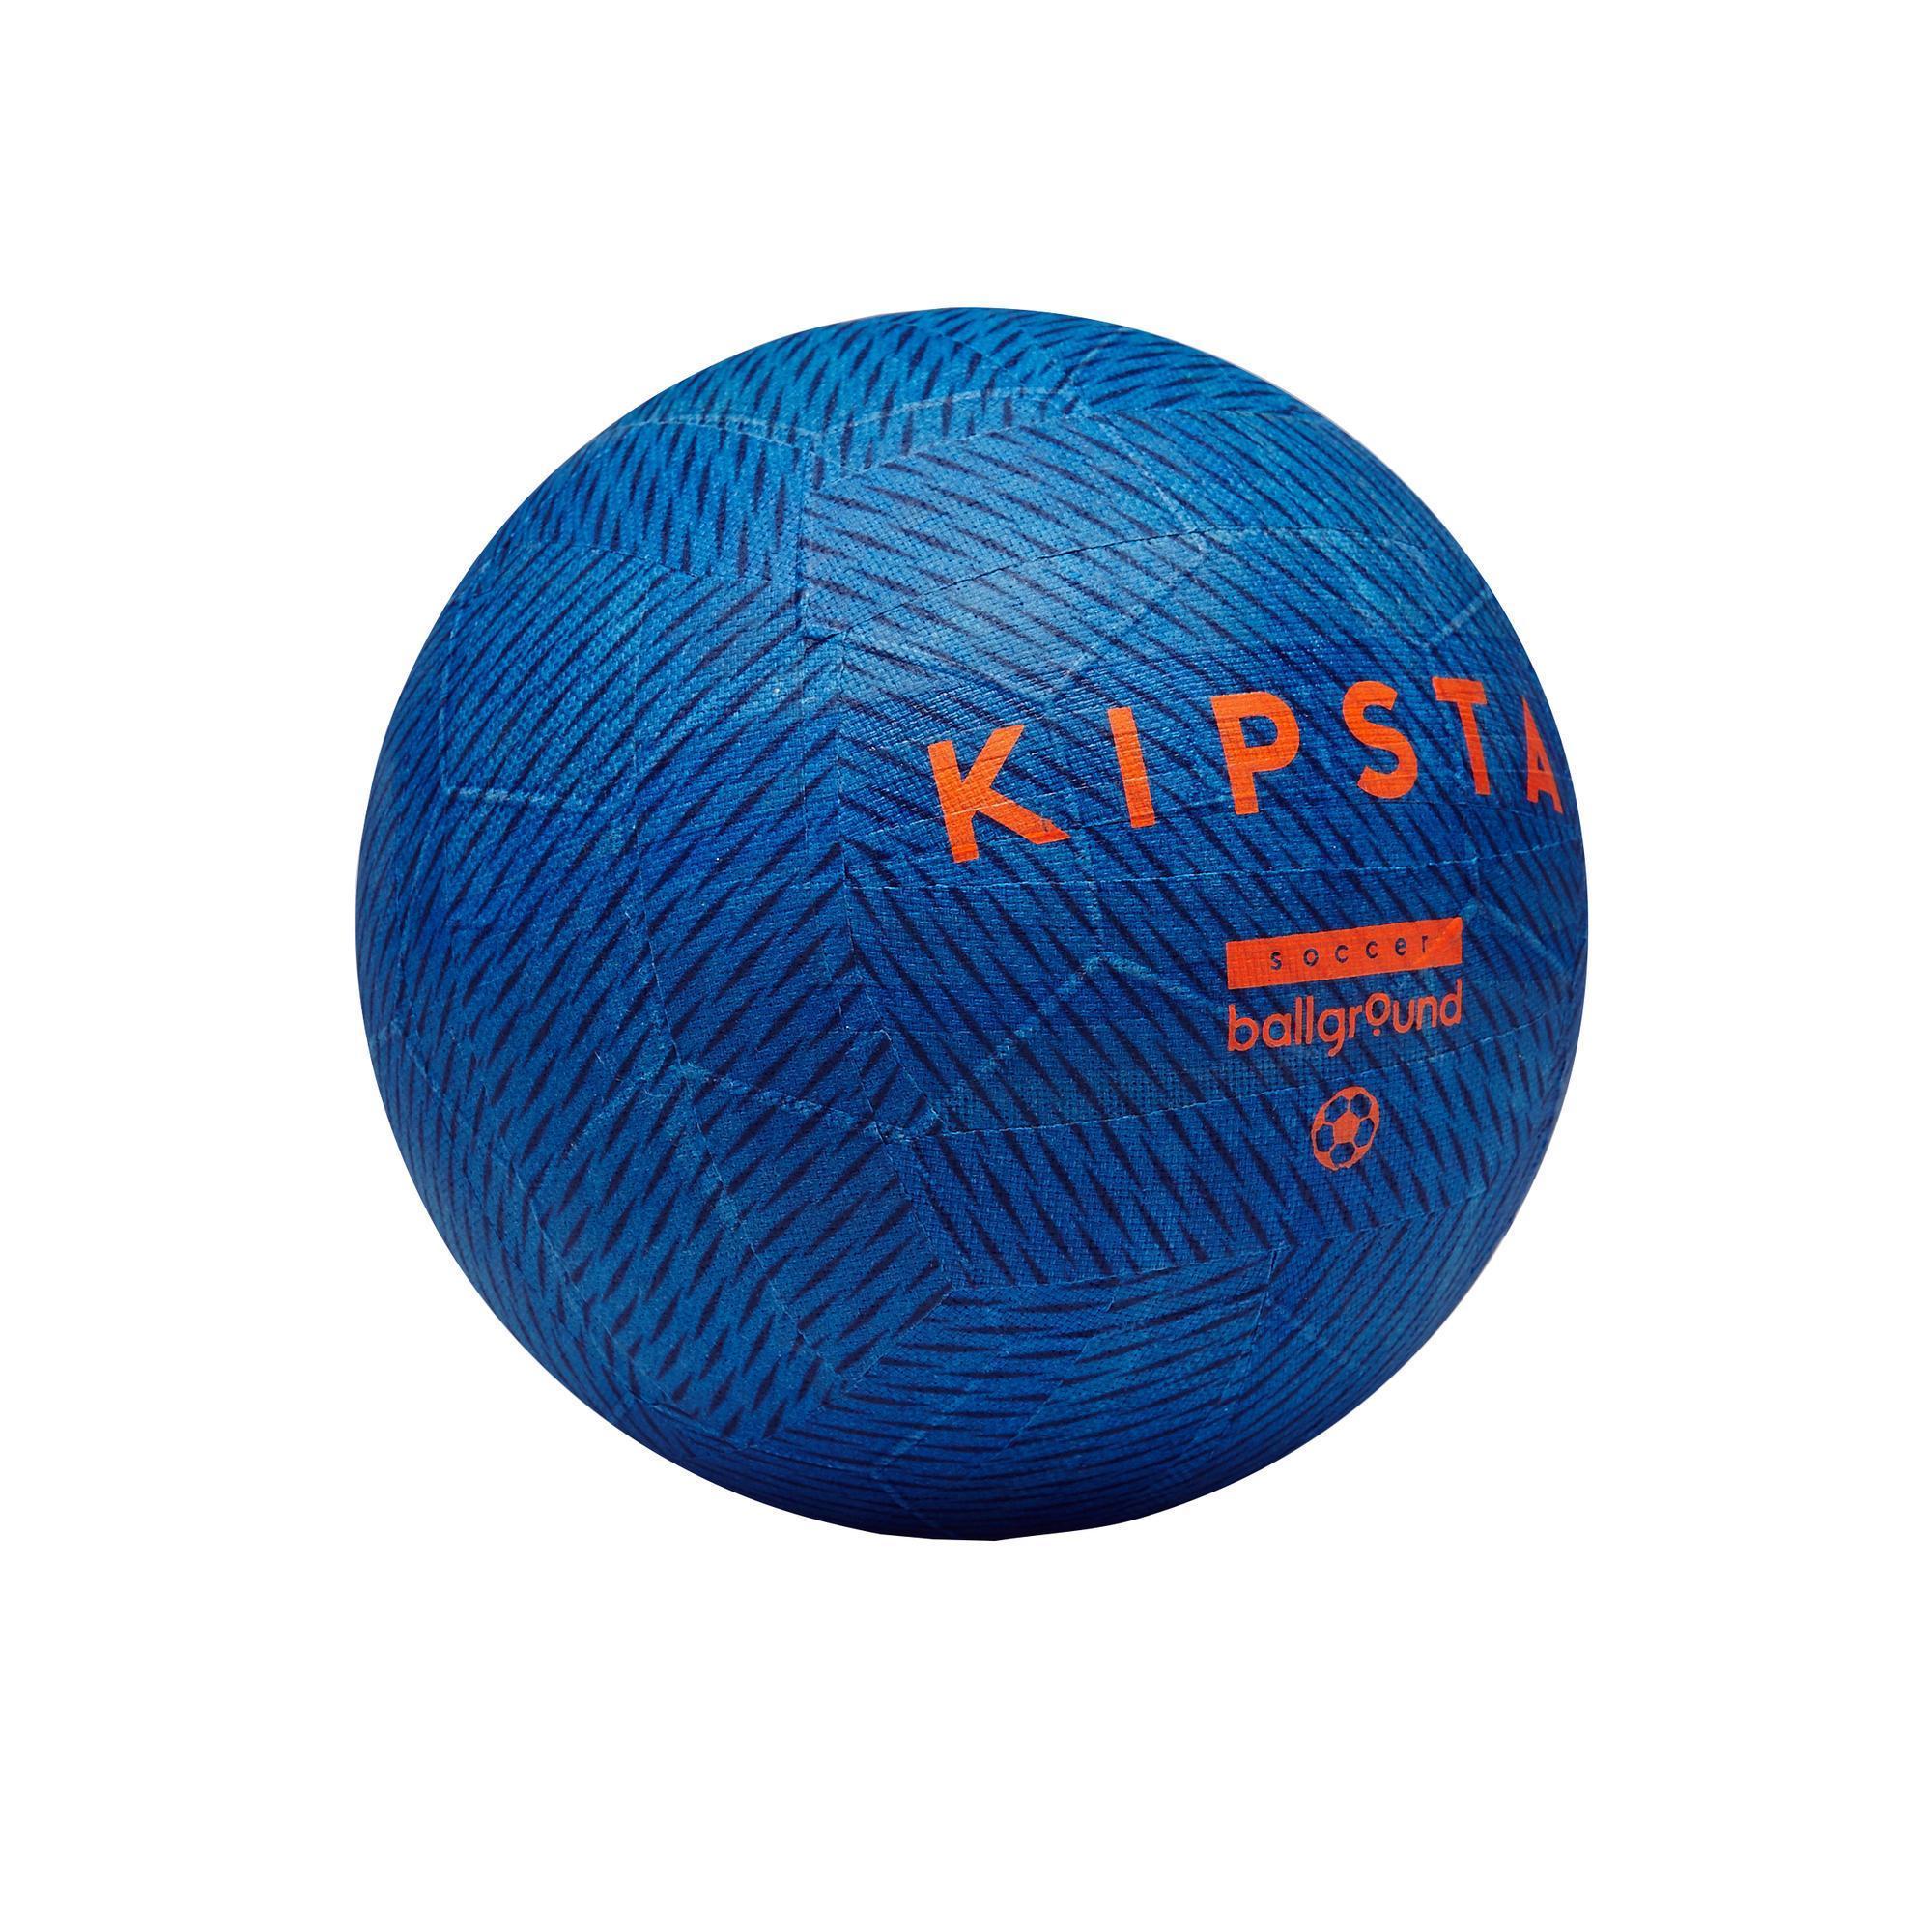 Kipsta Minivoetbal Ballground 100 maat 1 blauw